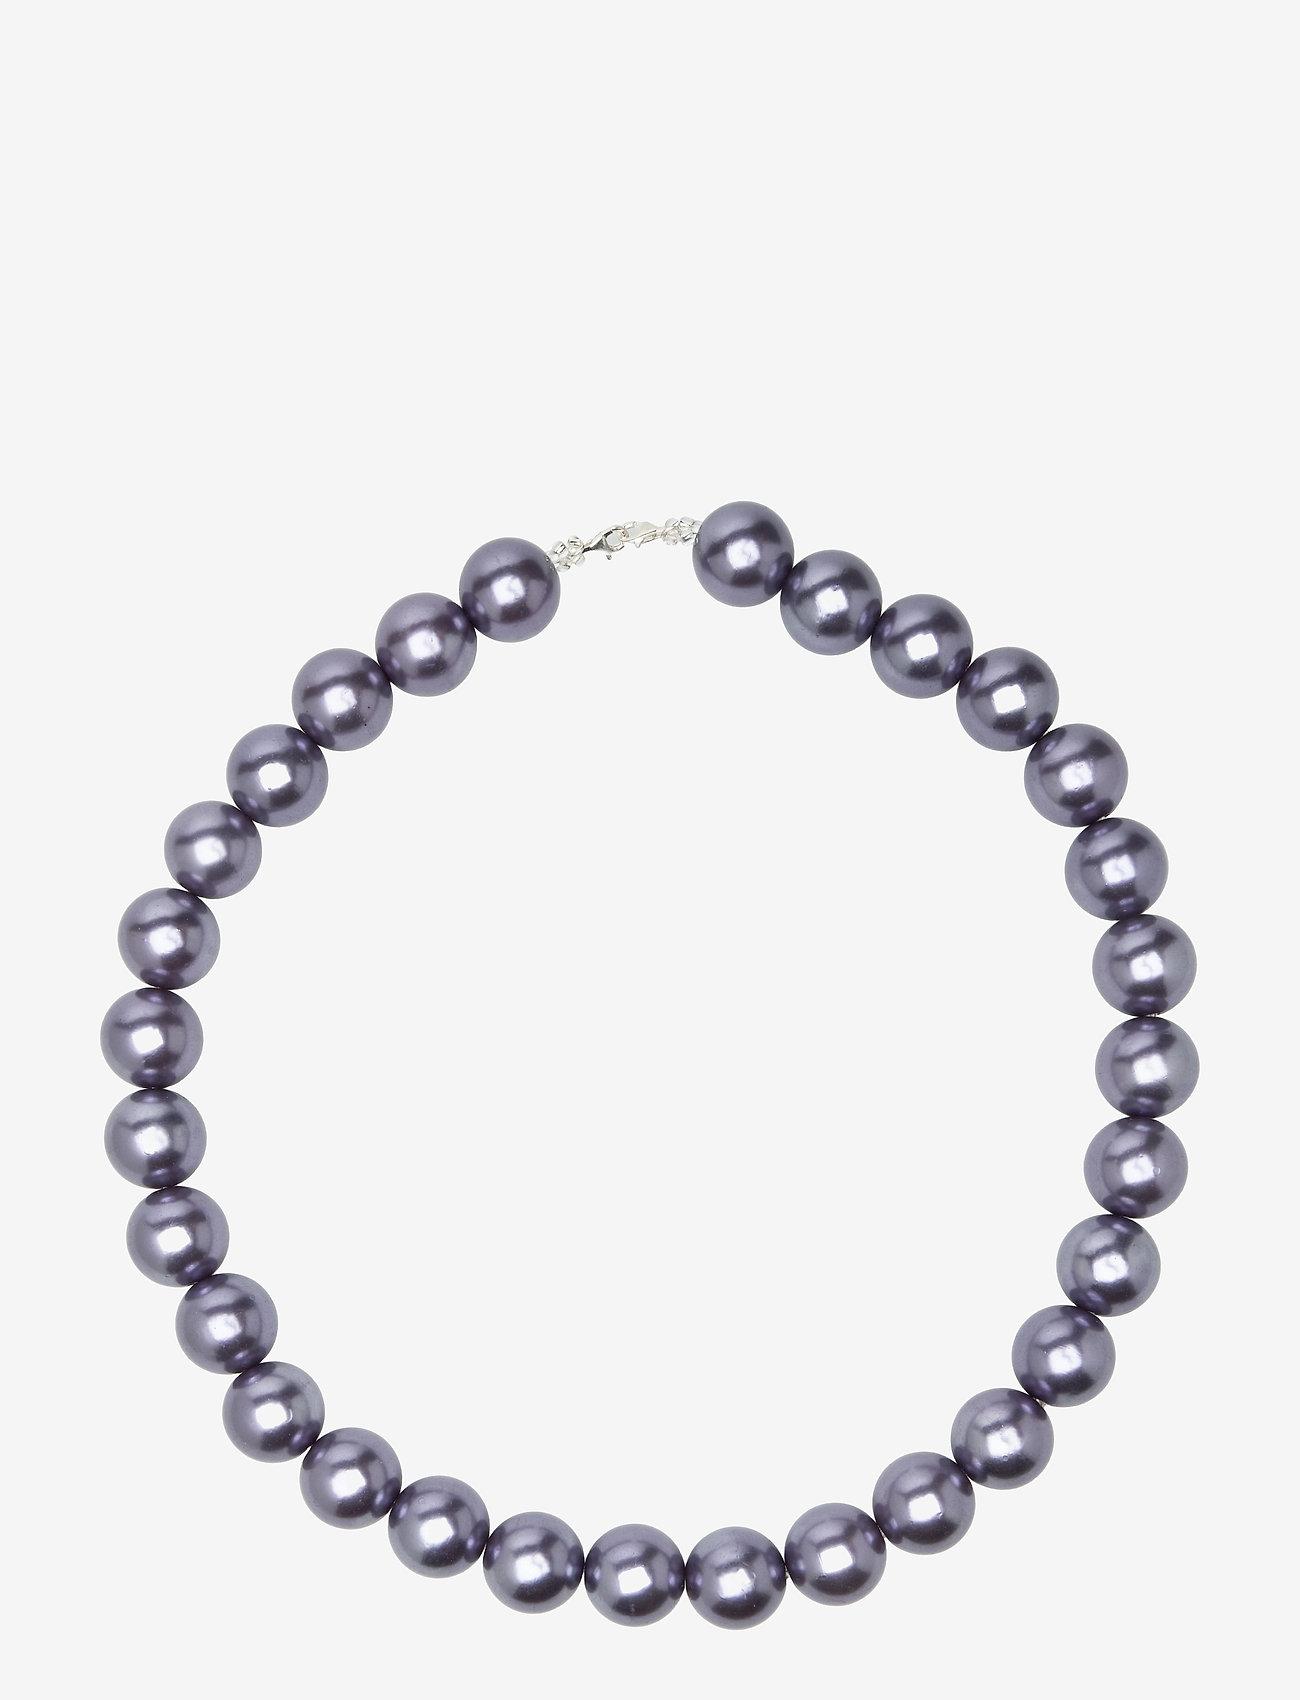 Custommade - Zerma Pearl - dainty - brushed nickel - 1